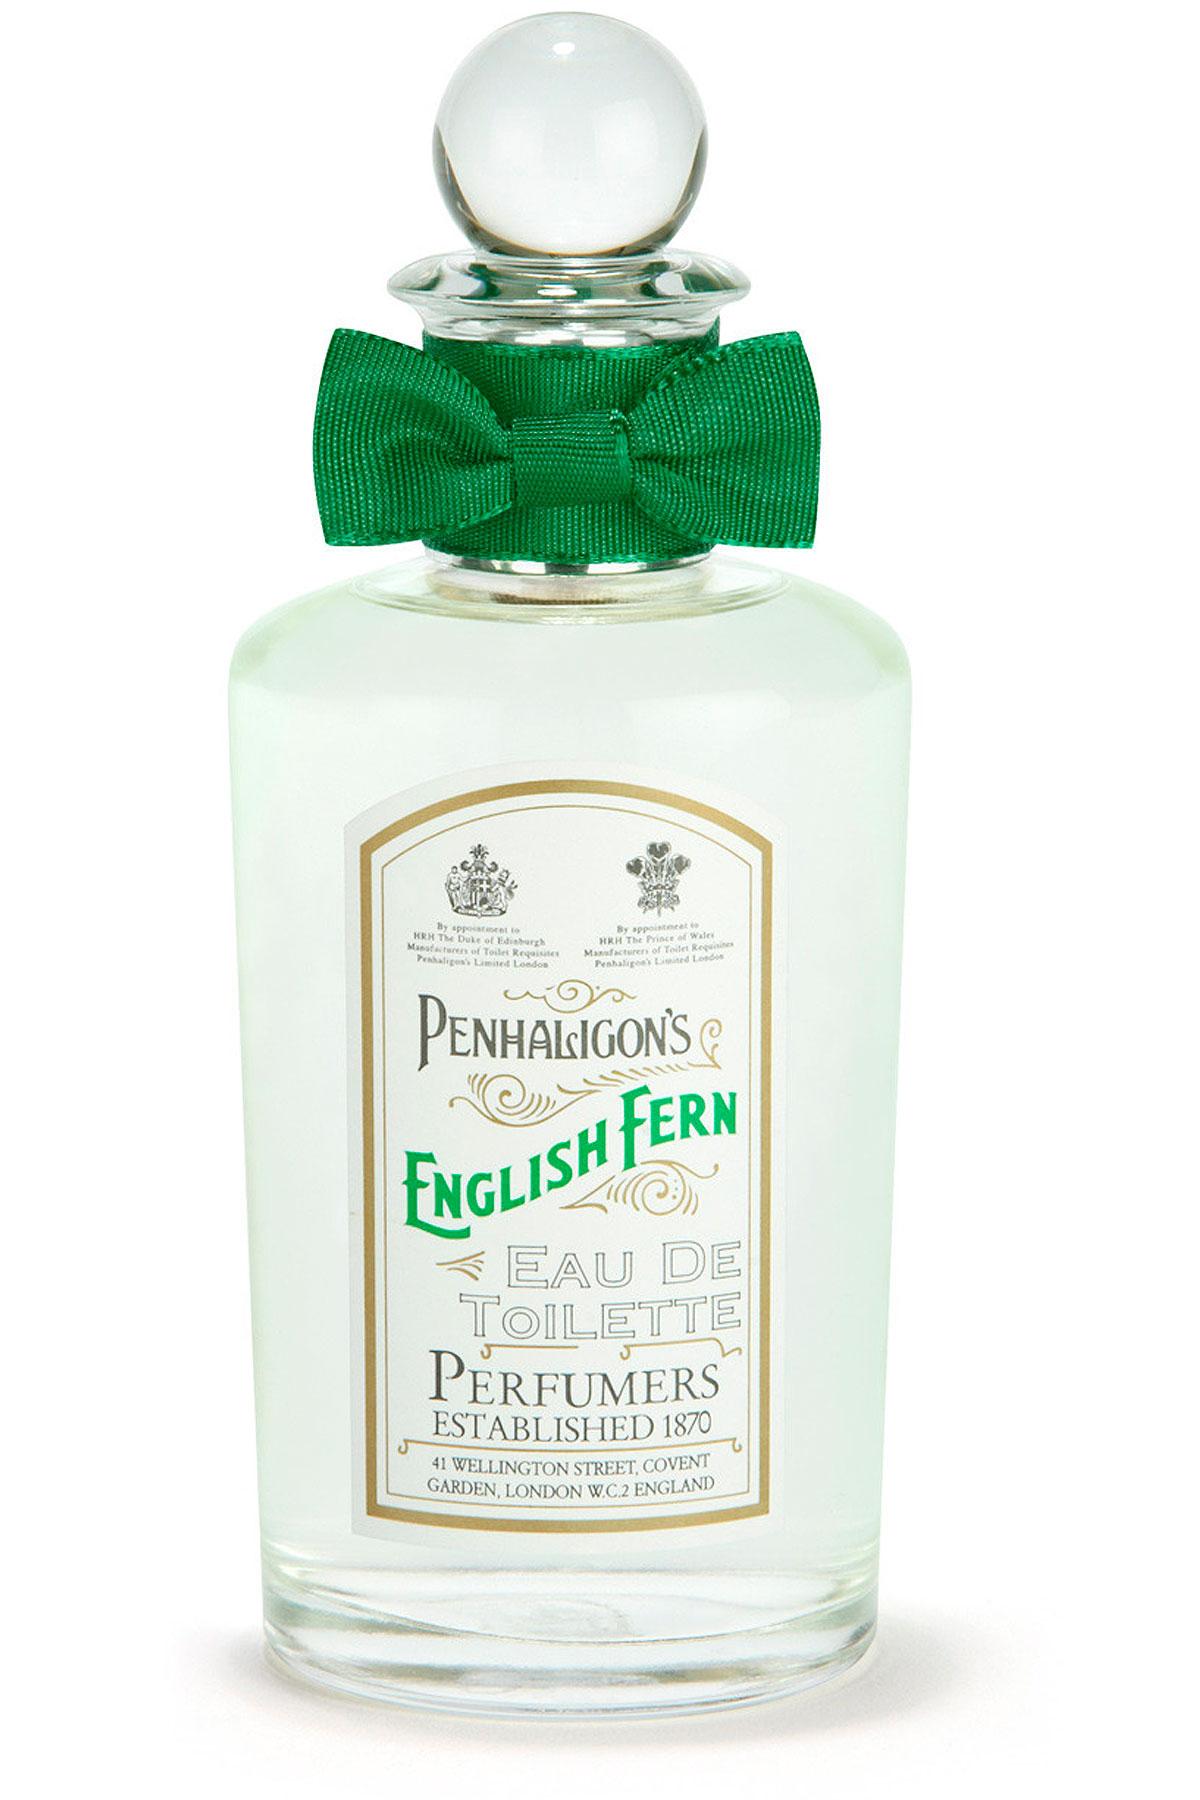 Penhaligon s London Fragrances for Men, English Fern - Eau De Toilette - 100 Ml, 2019, 100 ml